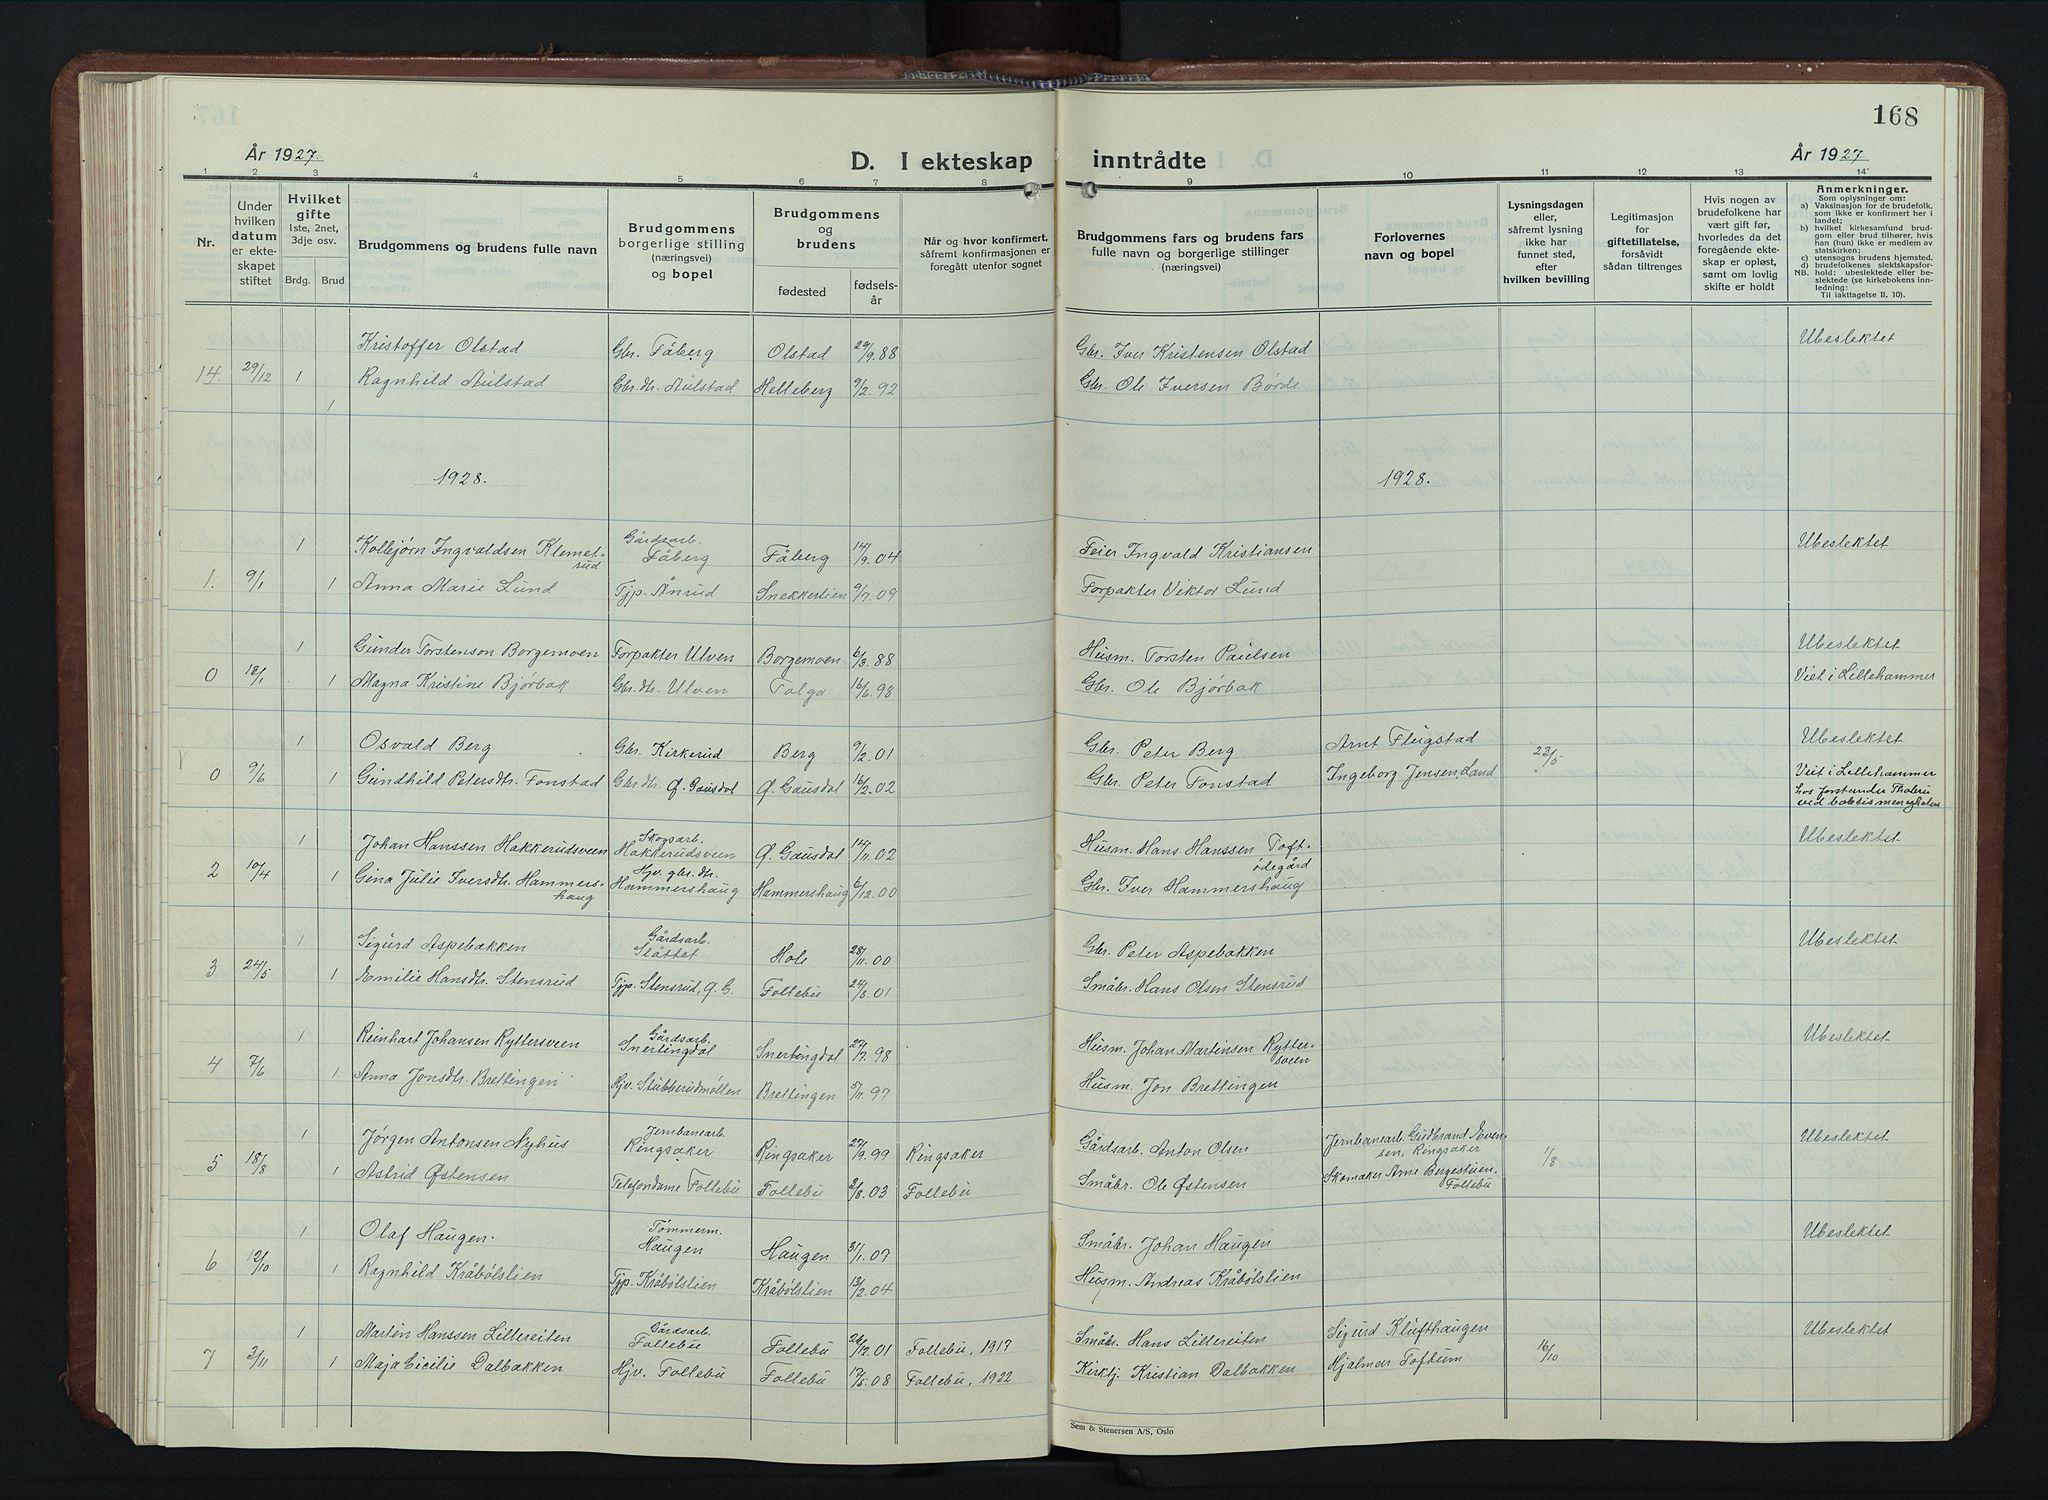 SAH, Vestre Gausdal prestekontor, Klokkerbok nr. 5, 1926-1955, s. 168